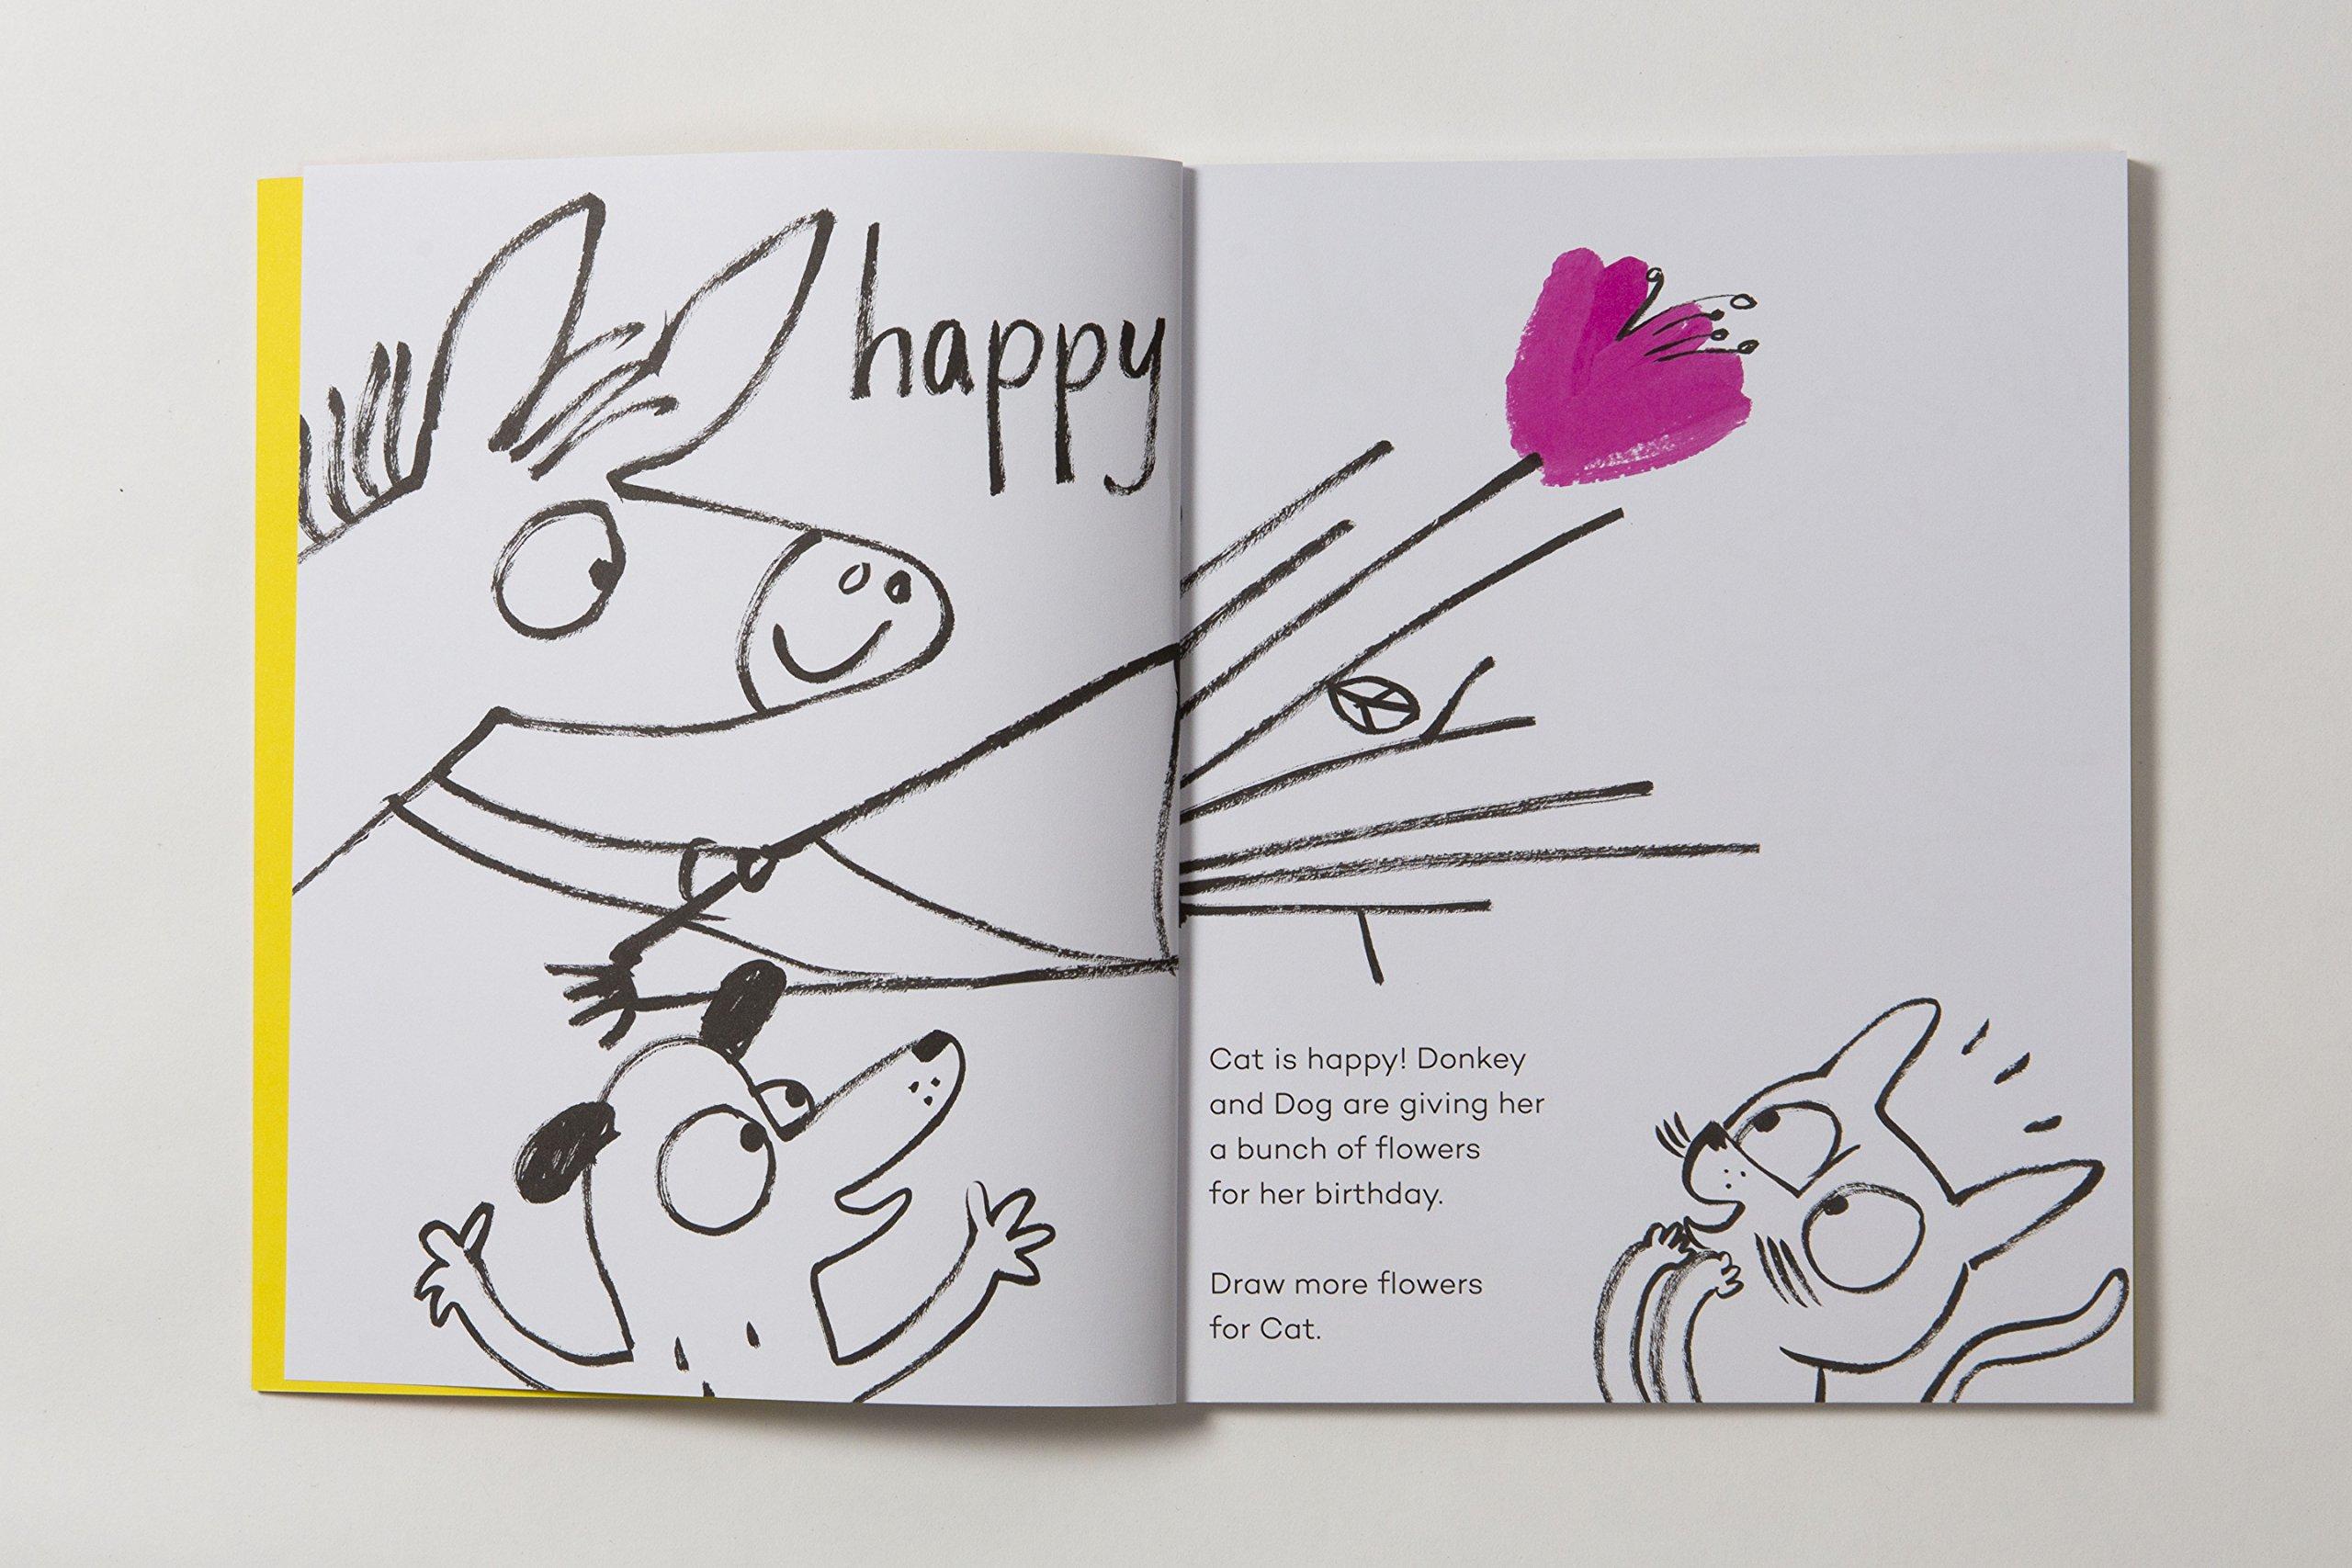 Happy Sad Feeling Glad Draw Discover Yasmeen Ismail Kumon Creative Doodling Workbooks 2 Books 9781780679327